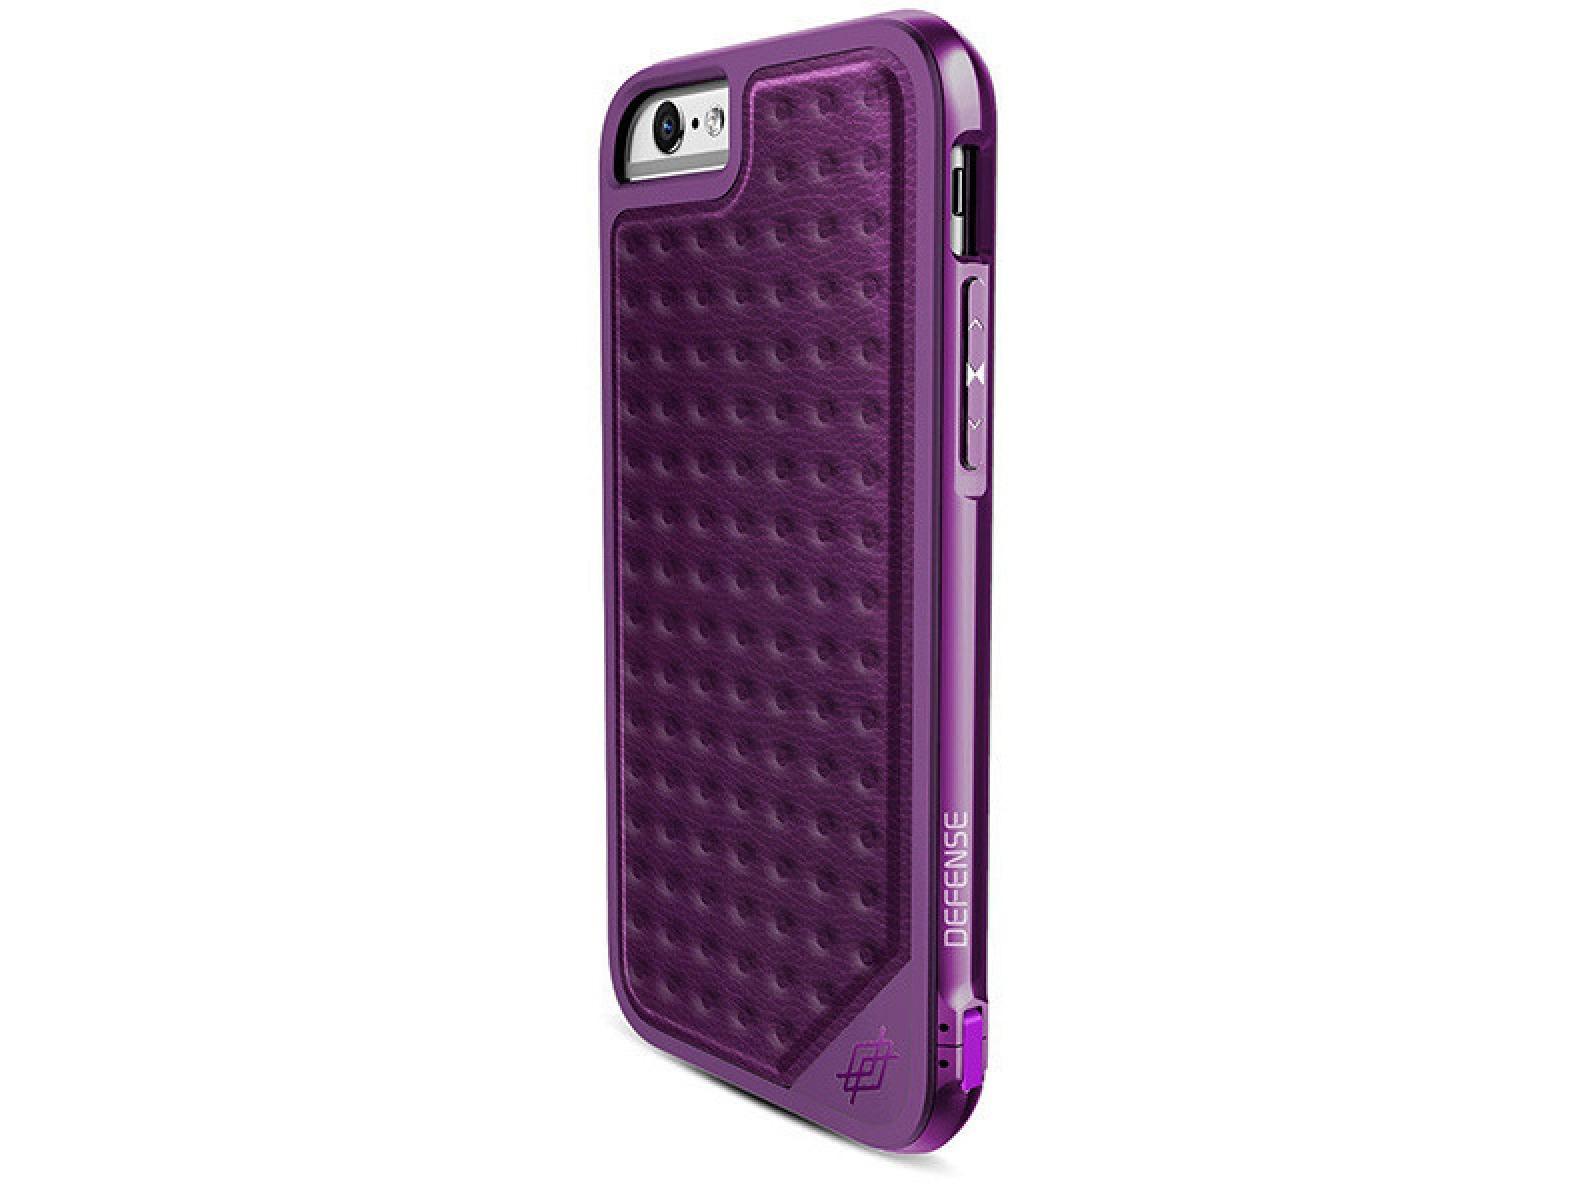 sports shoes cdb4d a749d Review: X-Doria's Protective iPhone 6s Case Is Tough but Luxurious ...